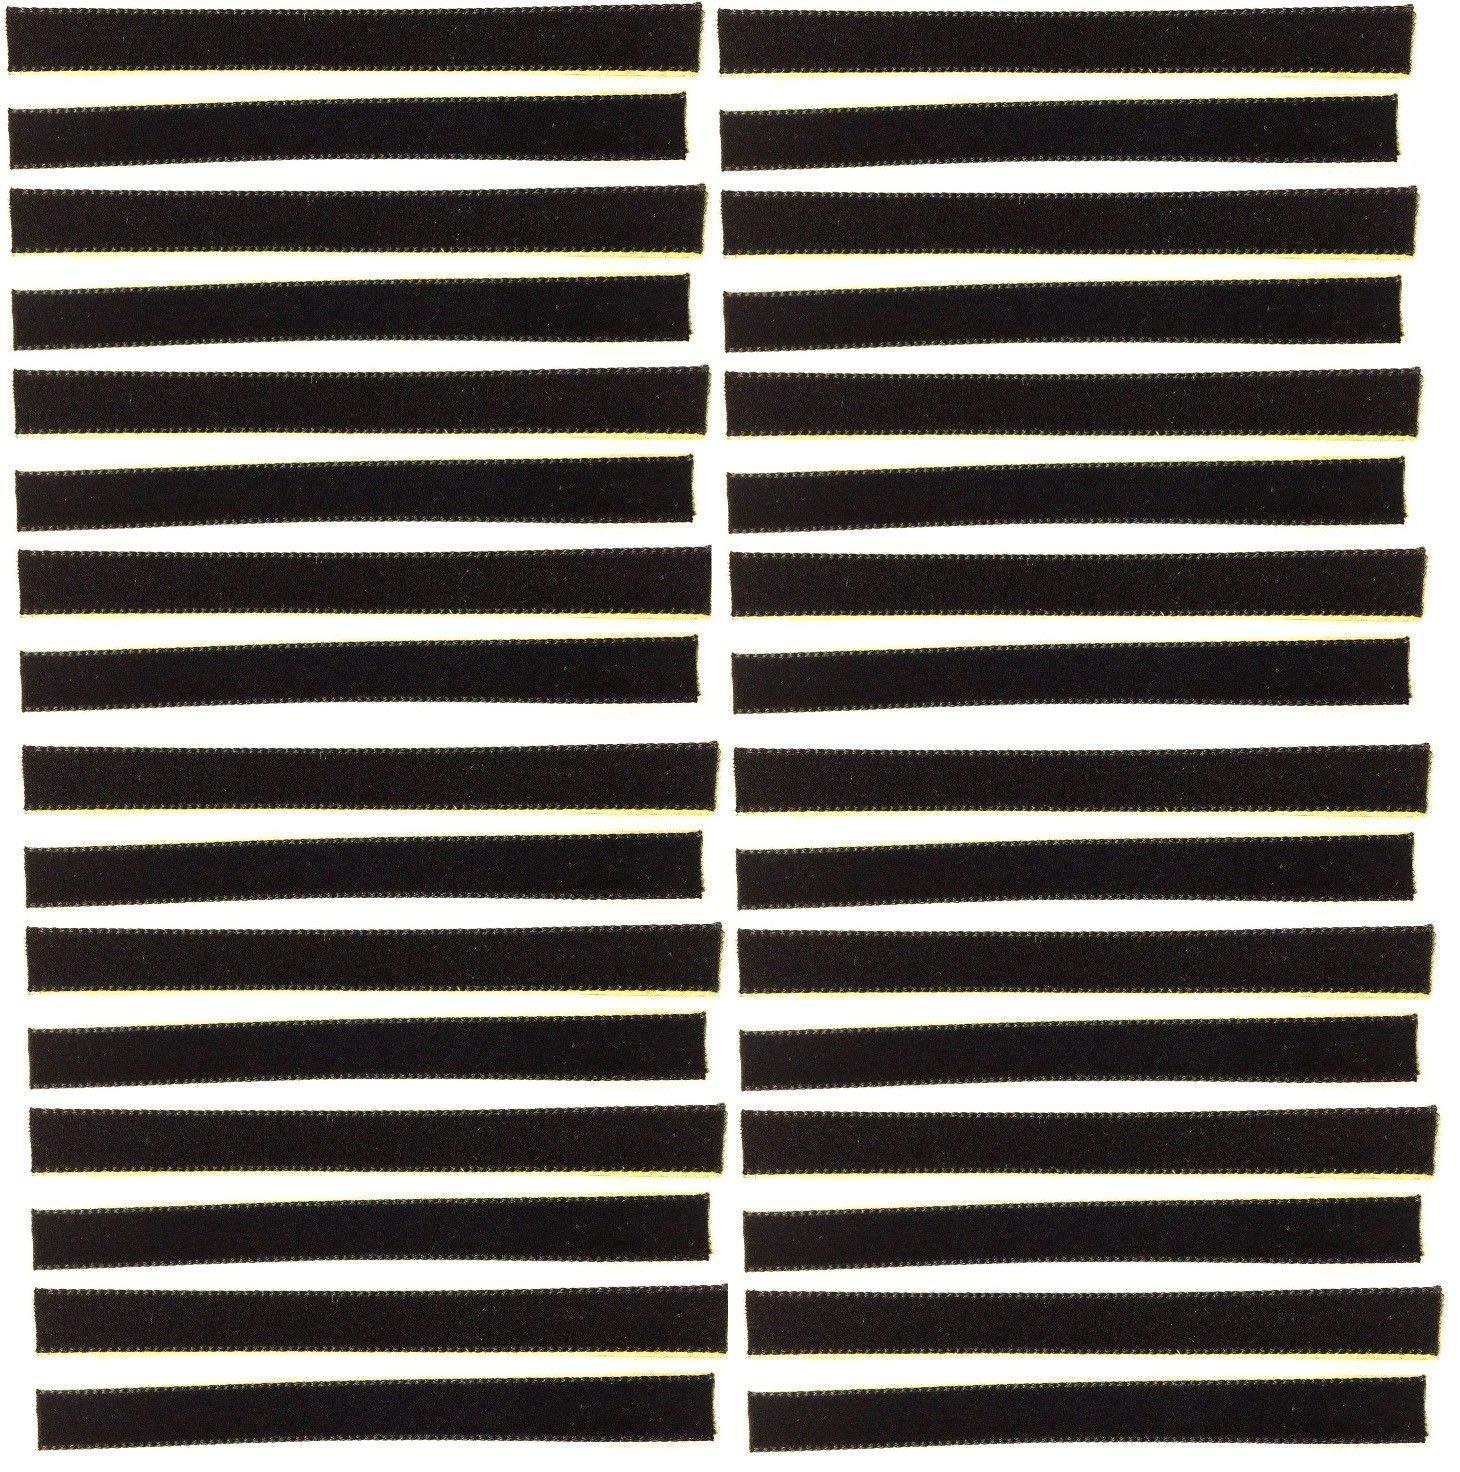 32-Pack of Black Over-Sized VPI Machine/Nitty Gritty/Okki Nokki Replacement LP Vinyl Record Album Cleaning/Cleaner Strips Oversized 3/8'' x 4'' Velvet/Felt/3M Adhesive